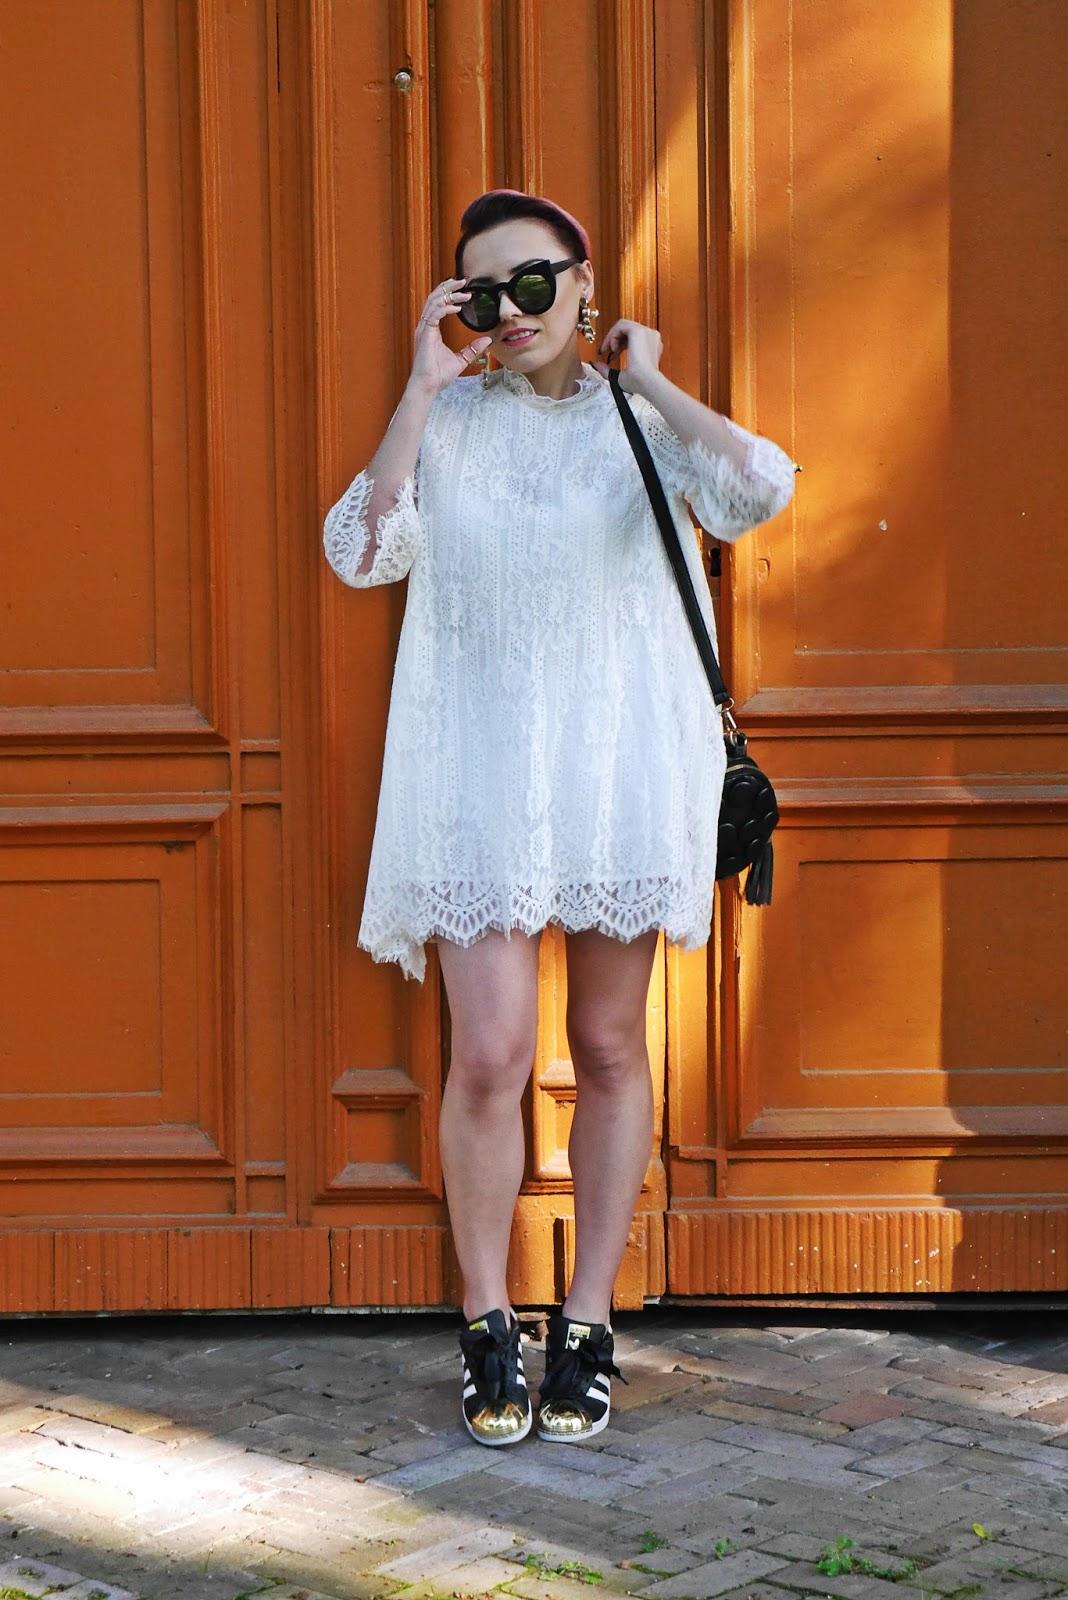 blogerka_modowa_blog_modowy_karyn_look_pulawy_250517